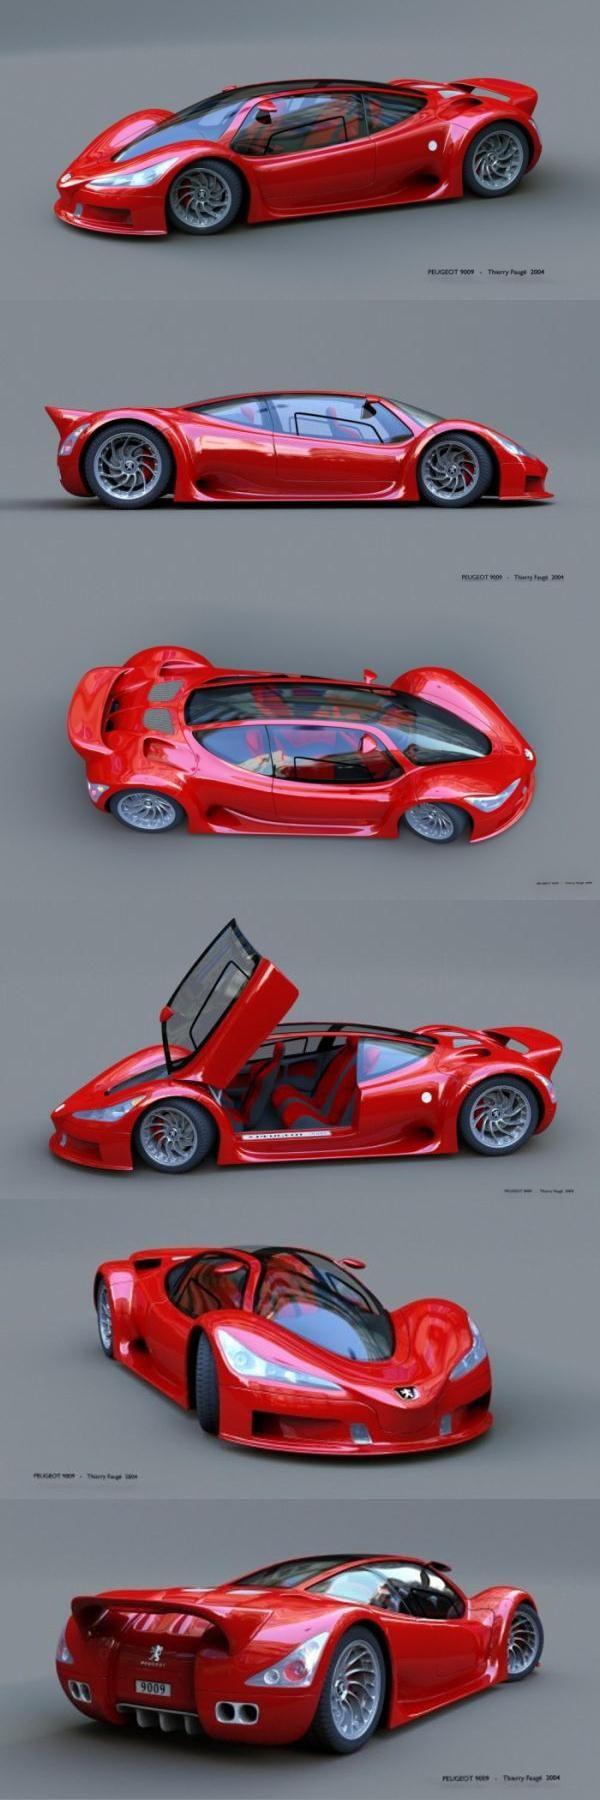 PEUGEOT 9009, Concept car-SR